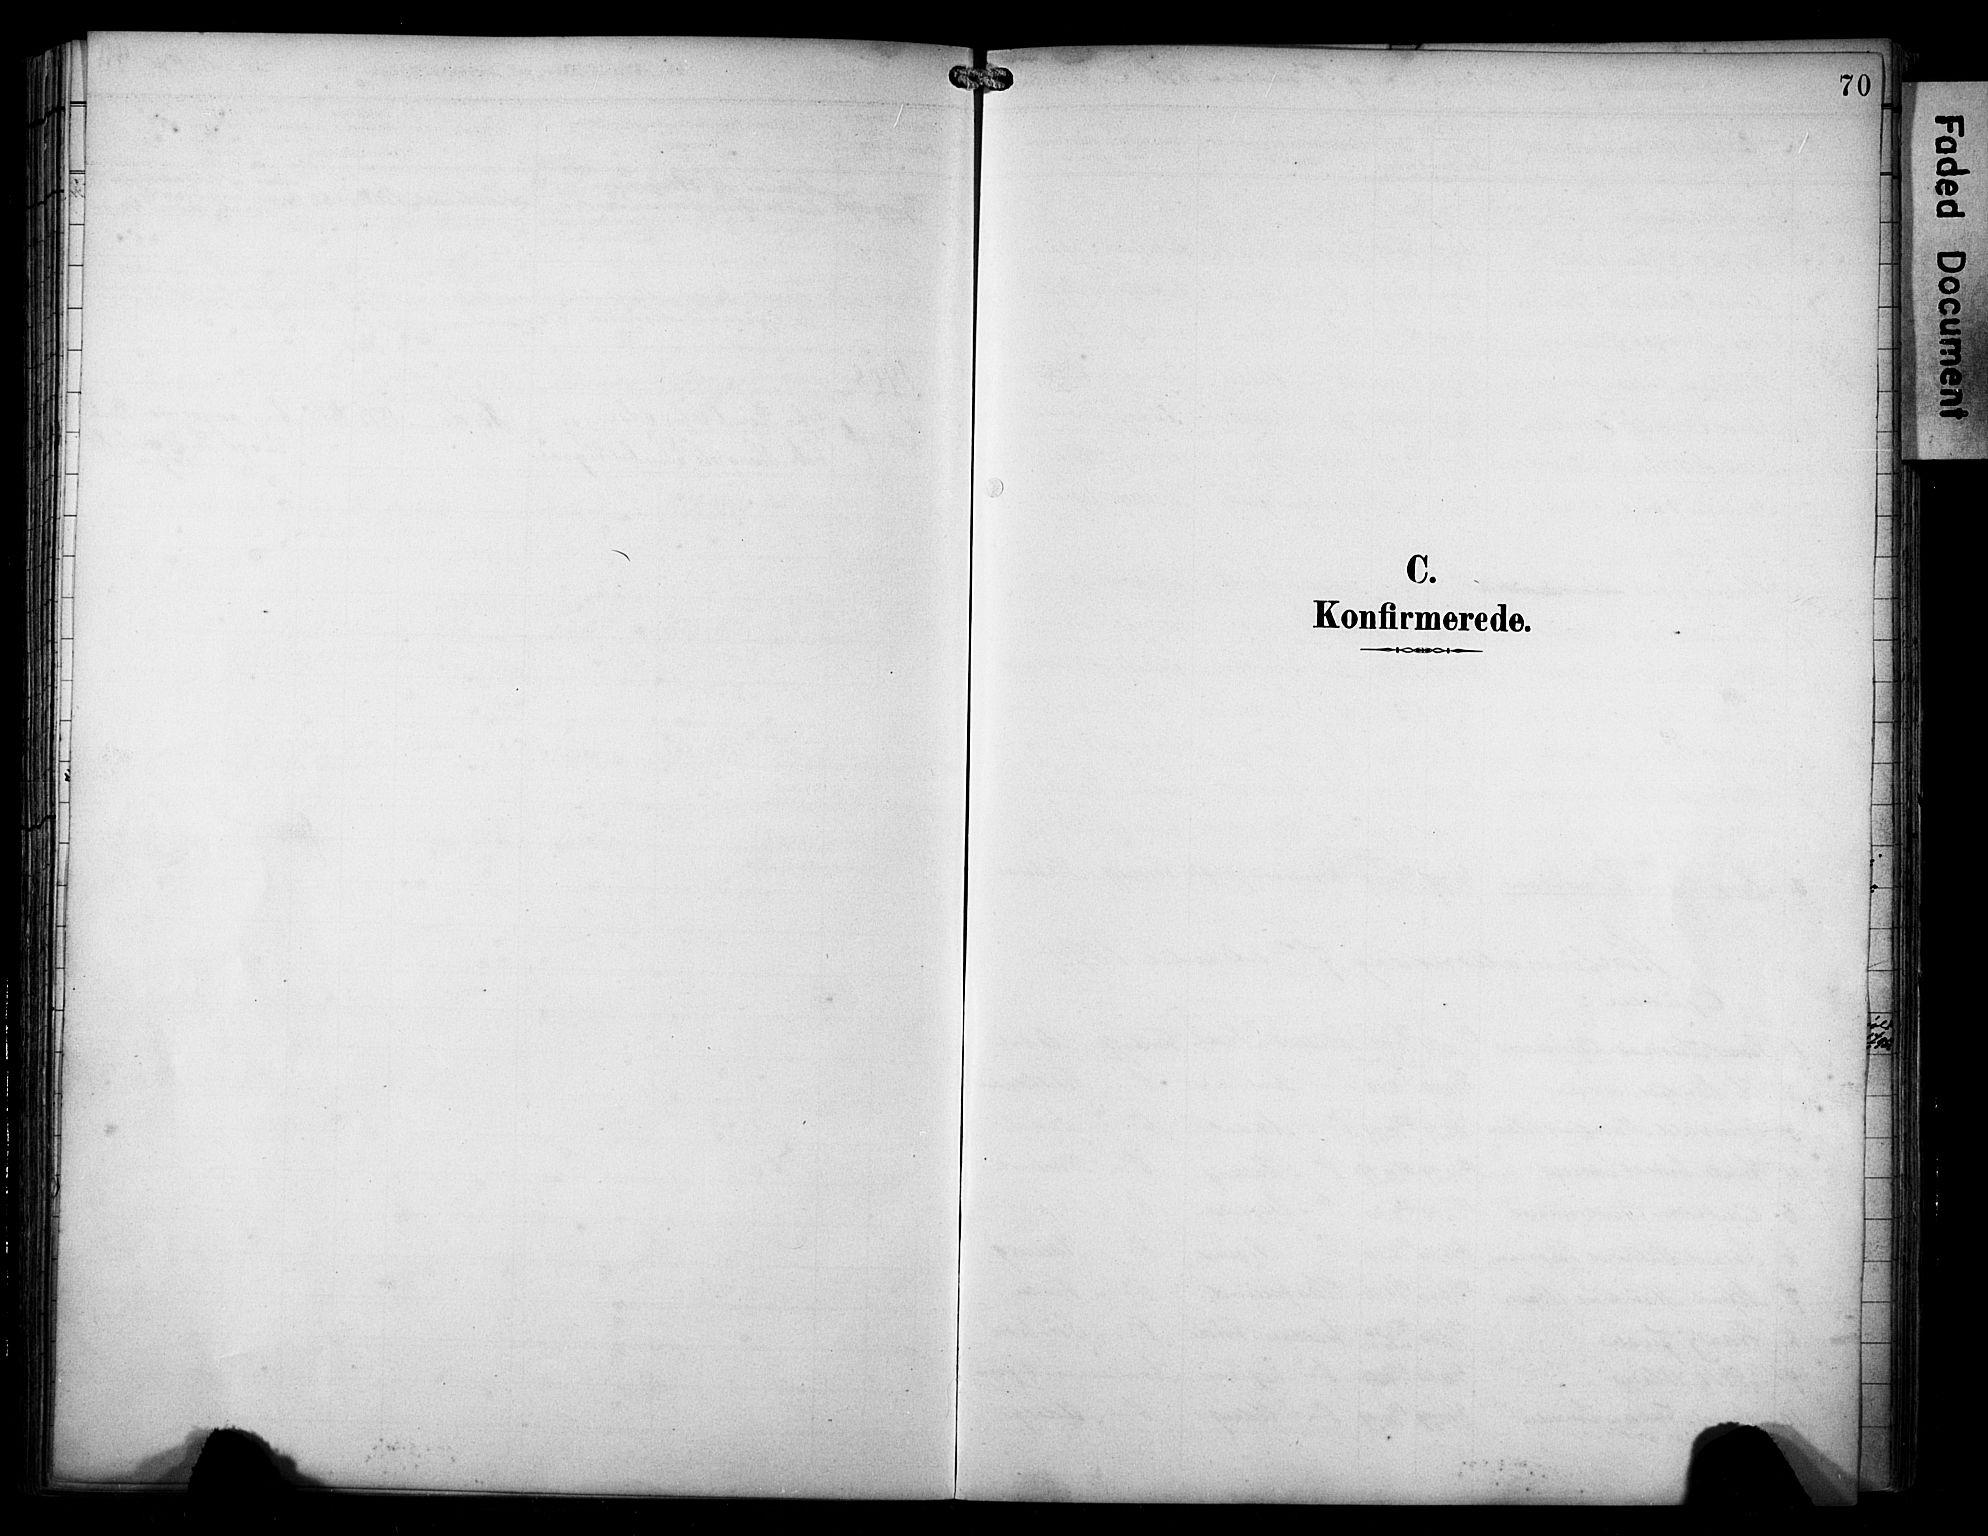 SAST, Avaldsnes sokneprestkontor, H/Ha/Haa/L0016: Ministerialbok nr. A 16, 1893-1918, s. 70